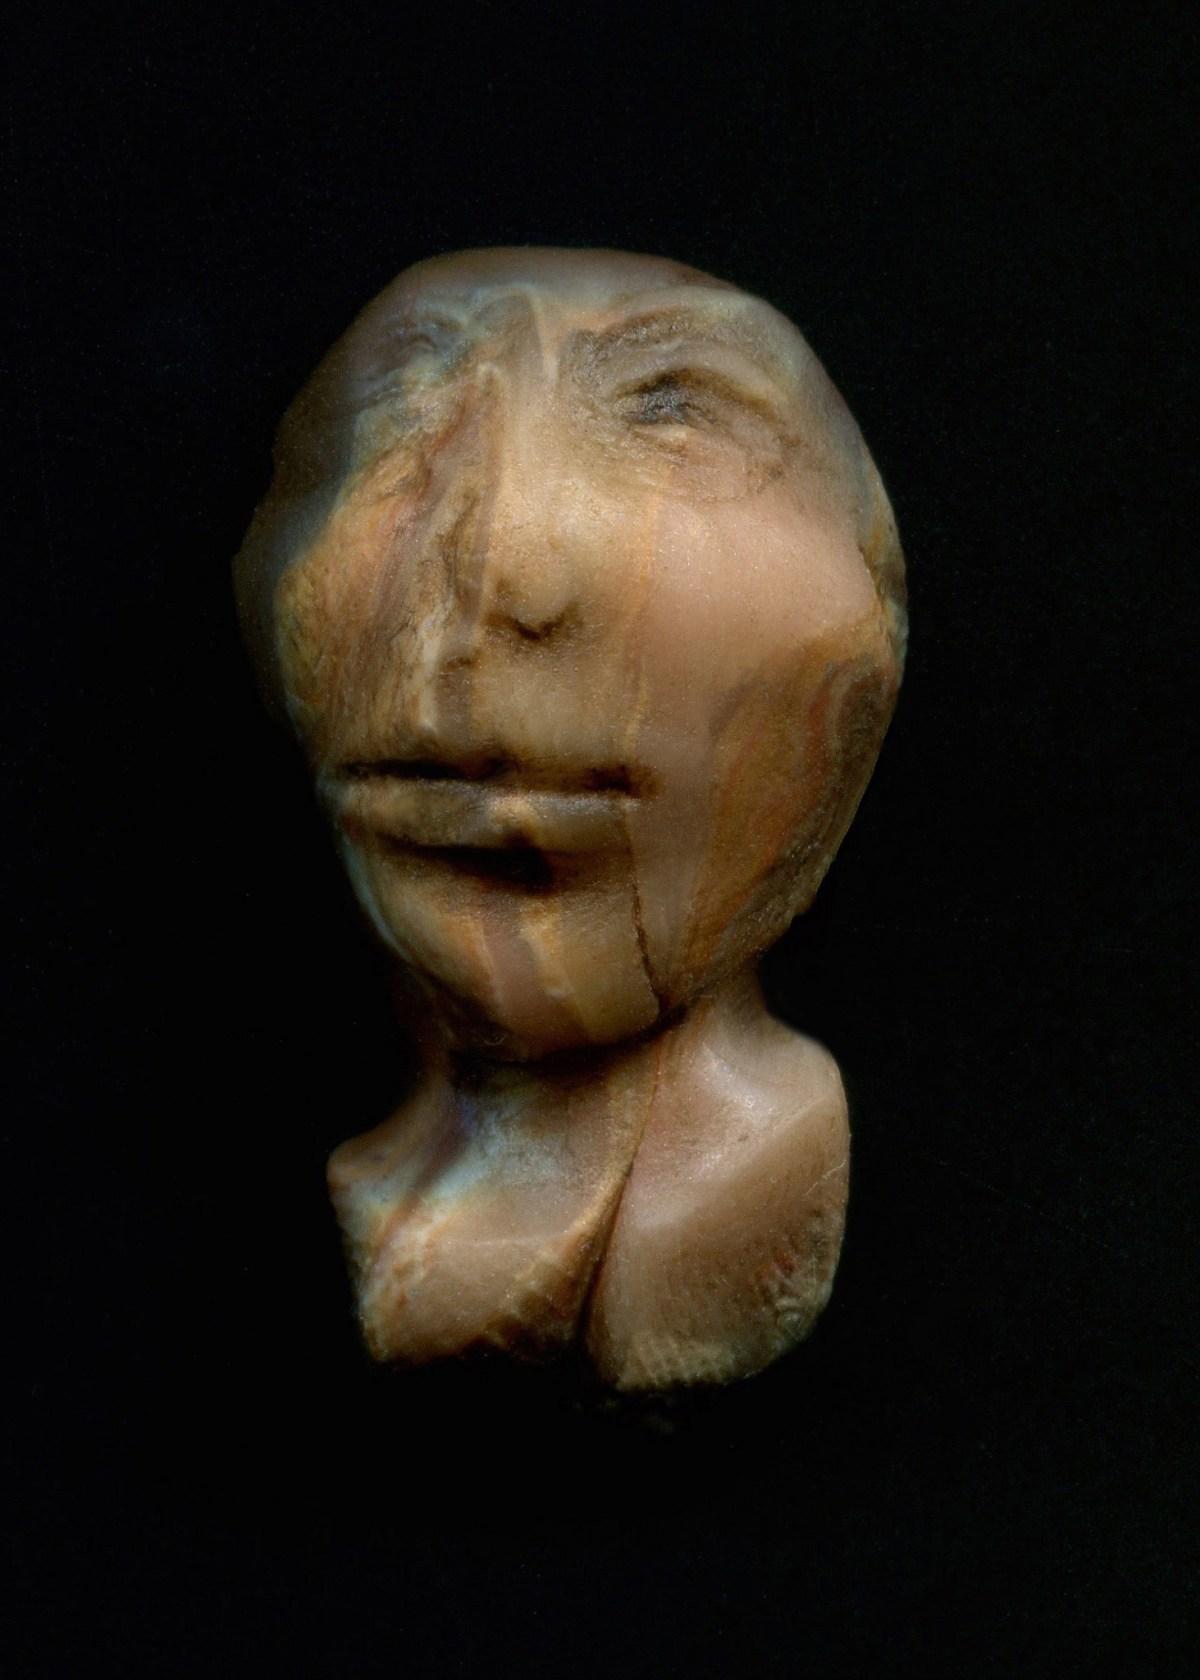 When receiving art, be Penelope, not Argos